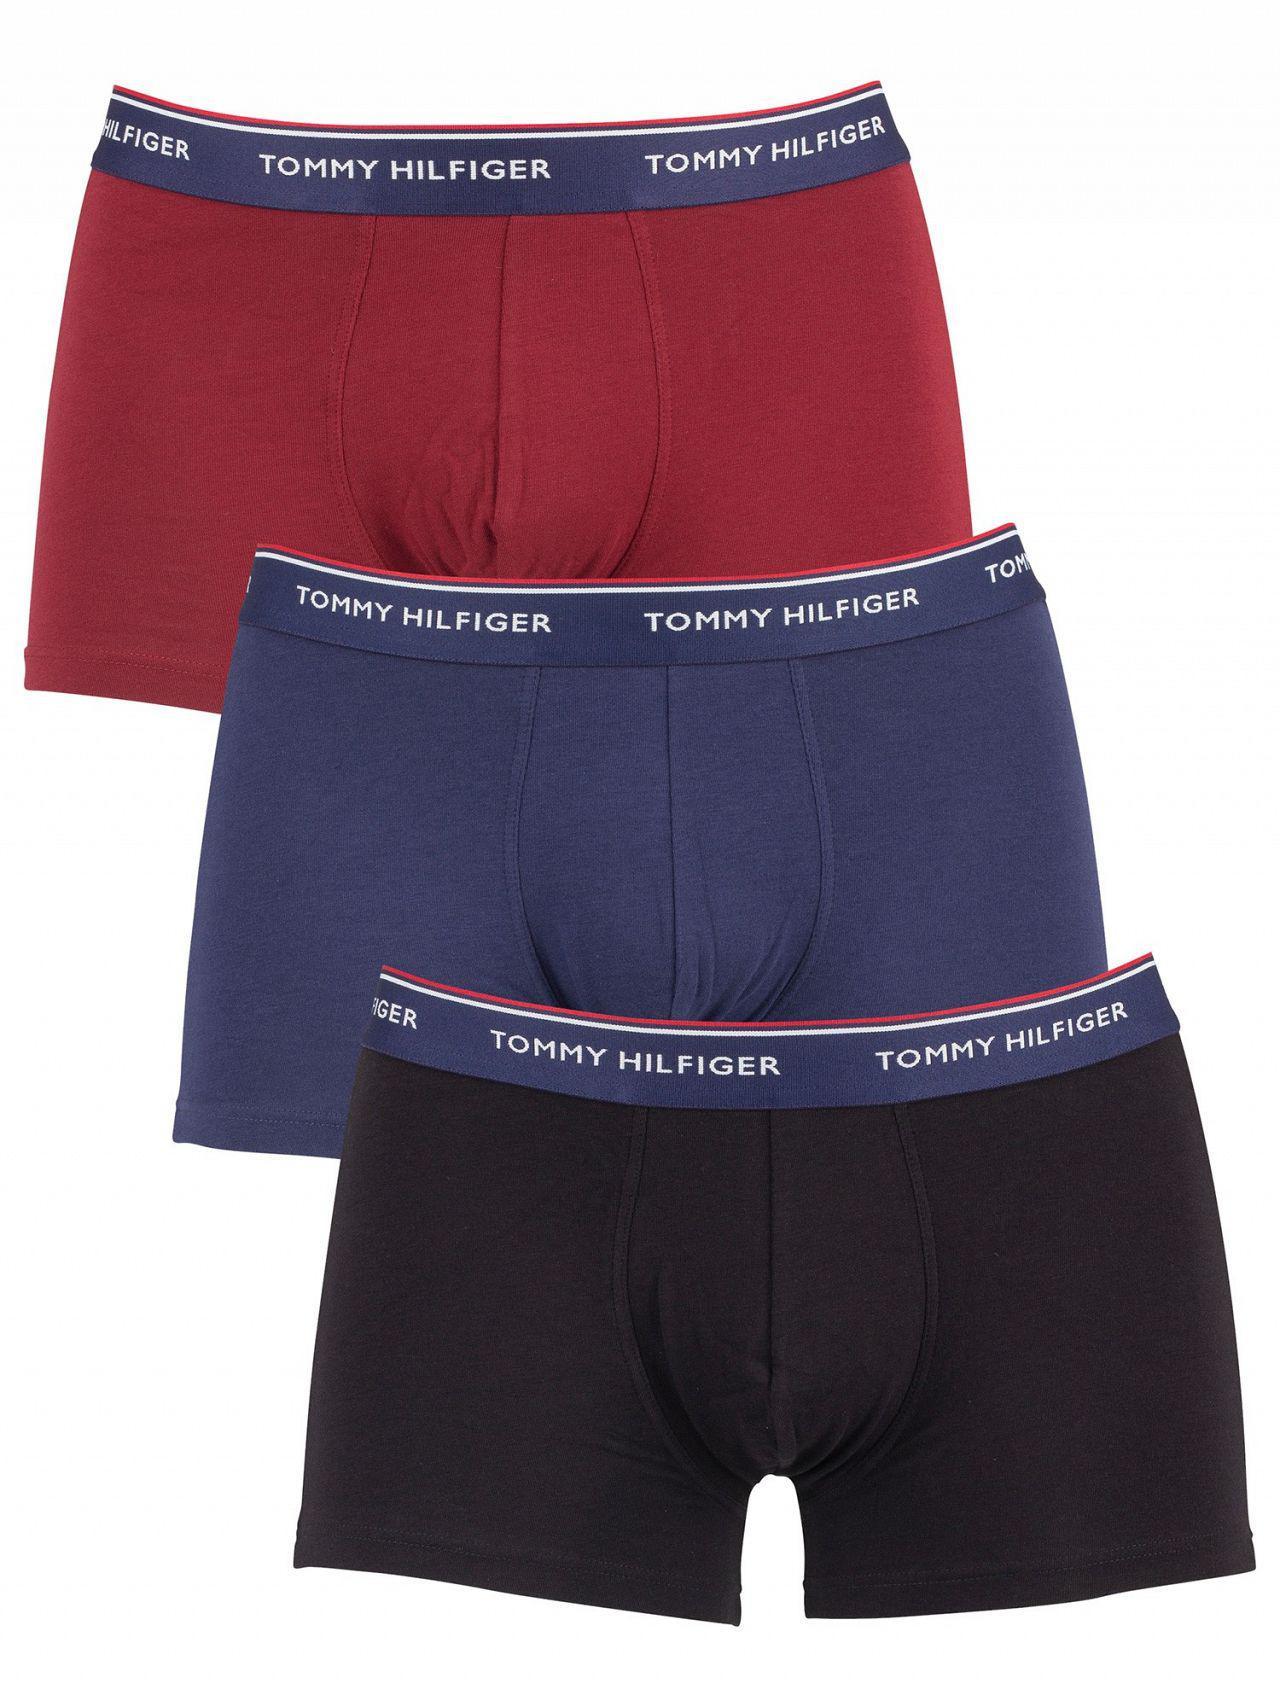 ce9144cde4f6 Tommy Hilfiger - Pomegranate/peacoat/black 3 Pack Premium Essentials Trunks  for Men -. View fullscreen